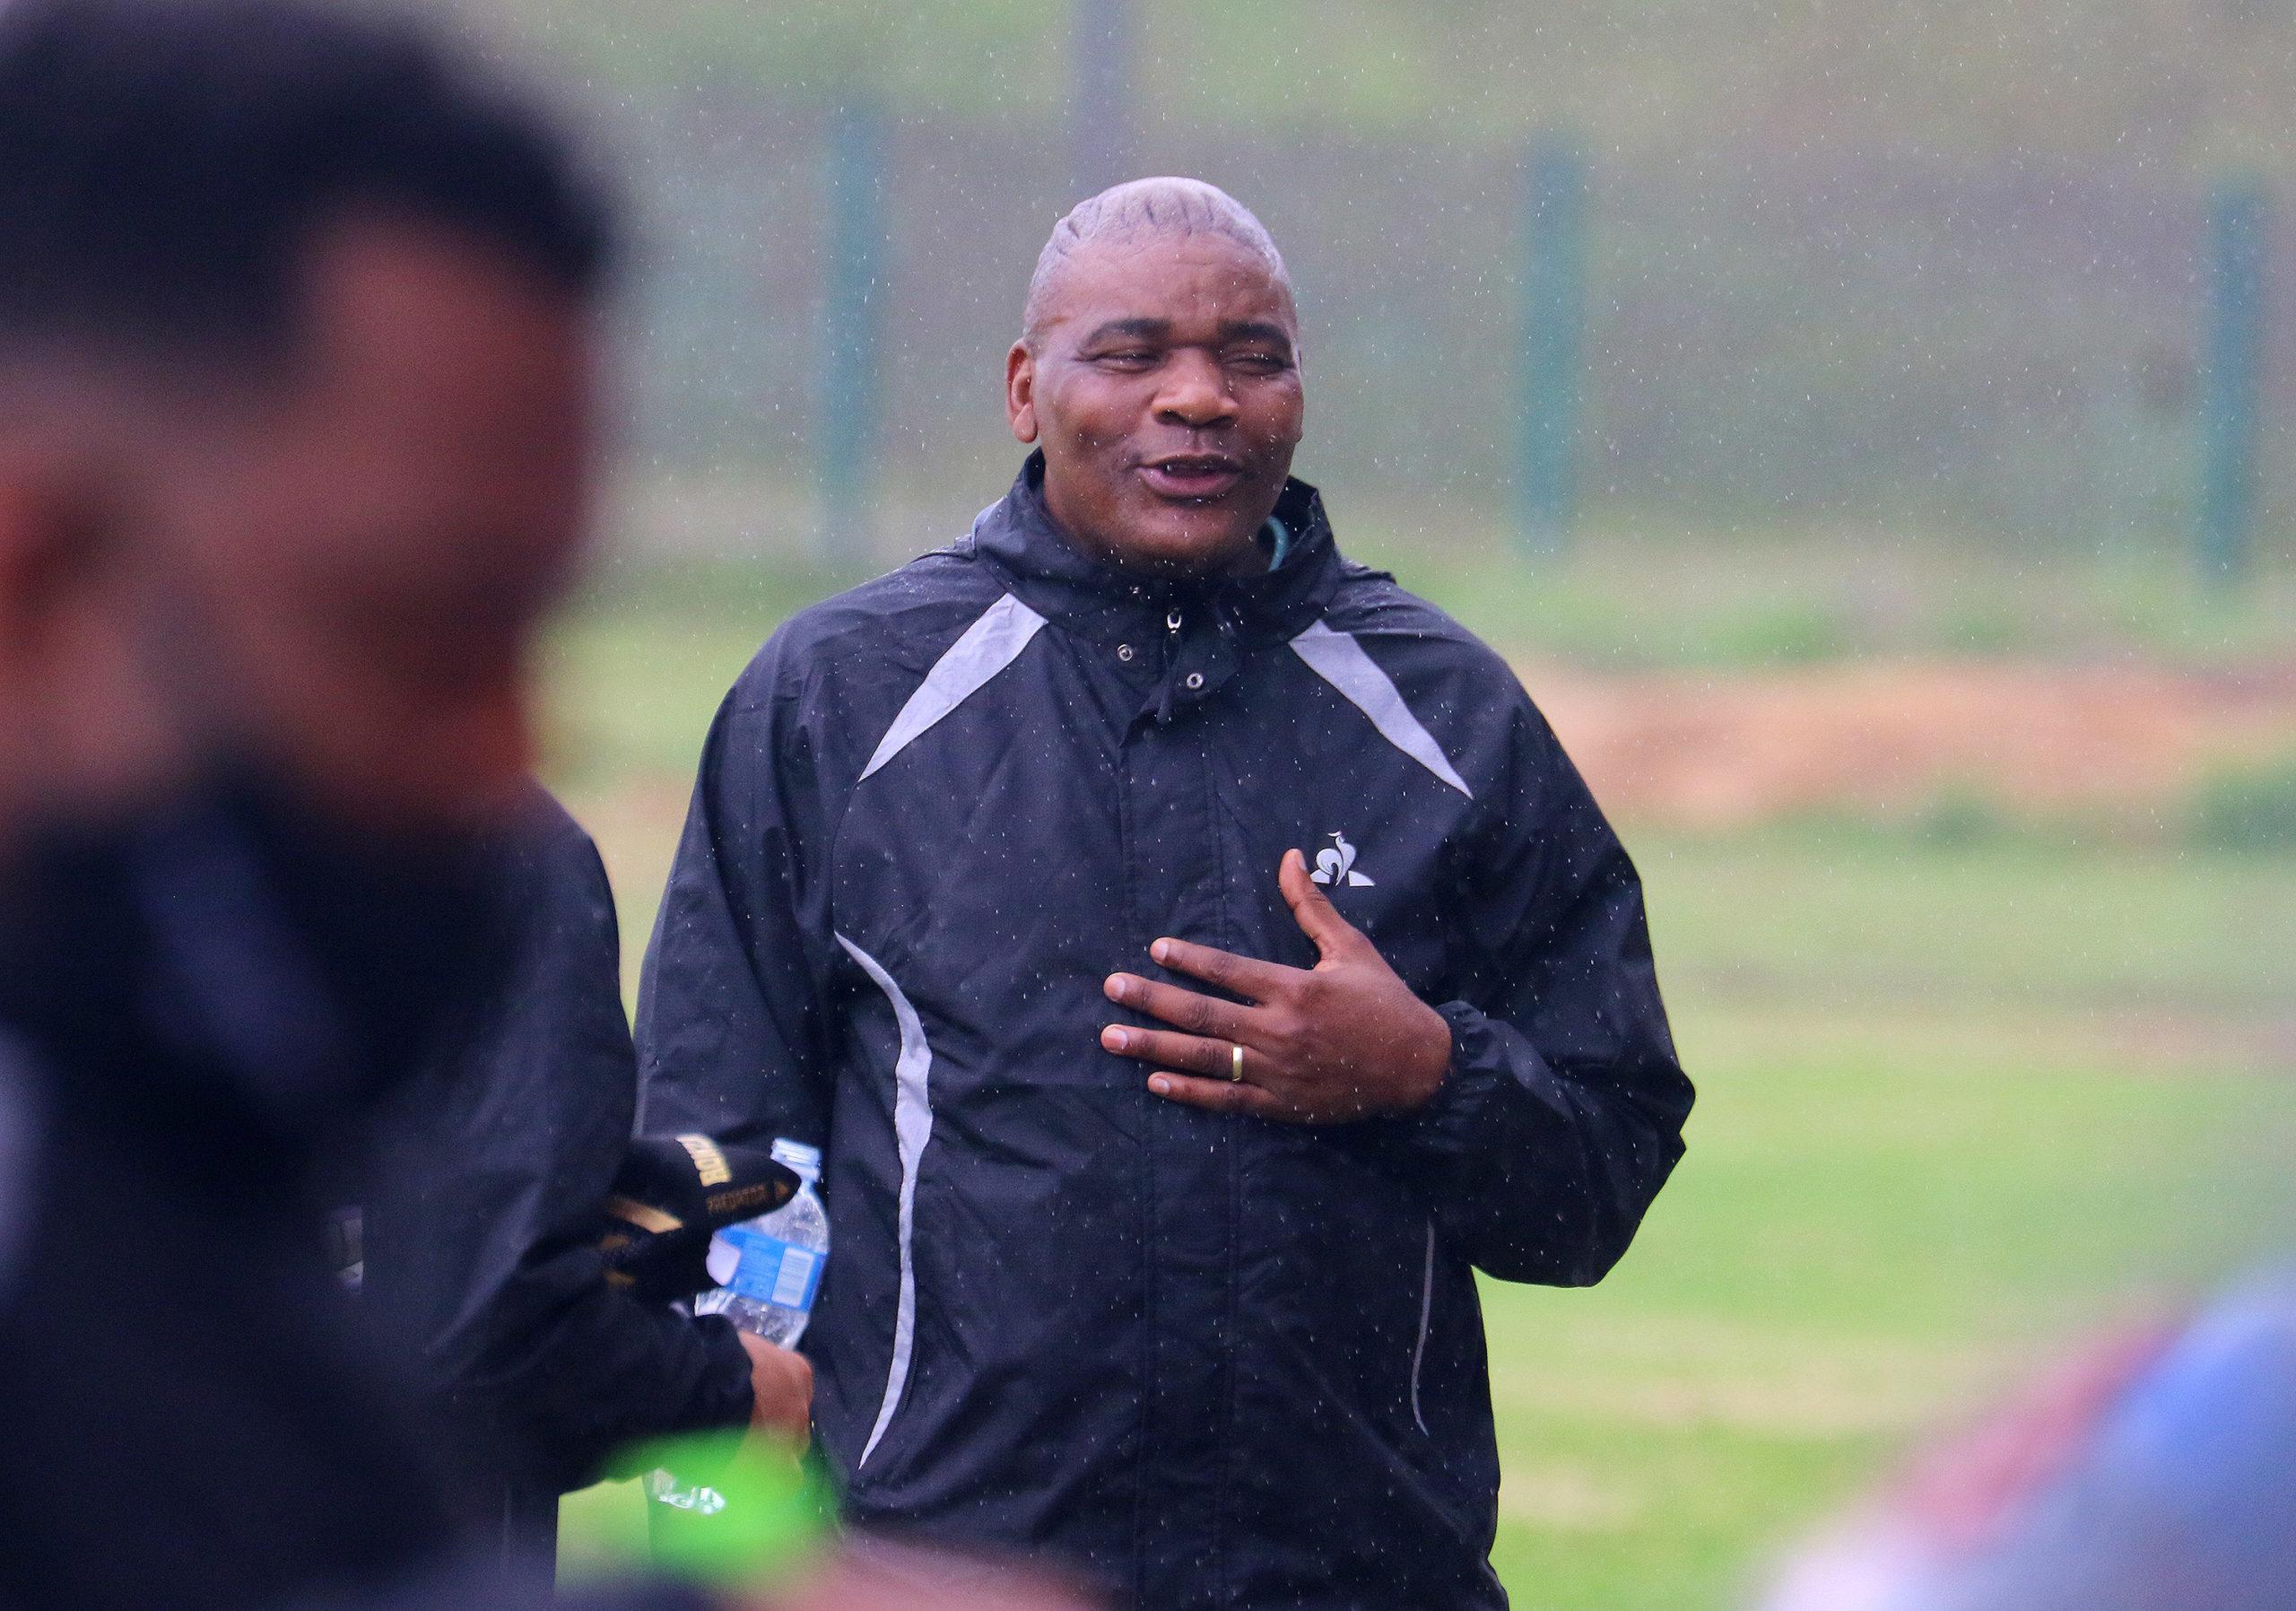 GALLERY: Bafana Bafana training session